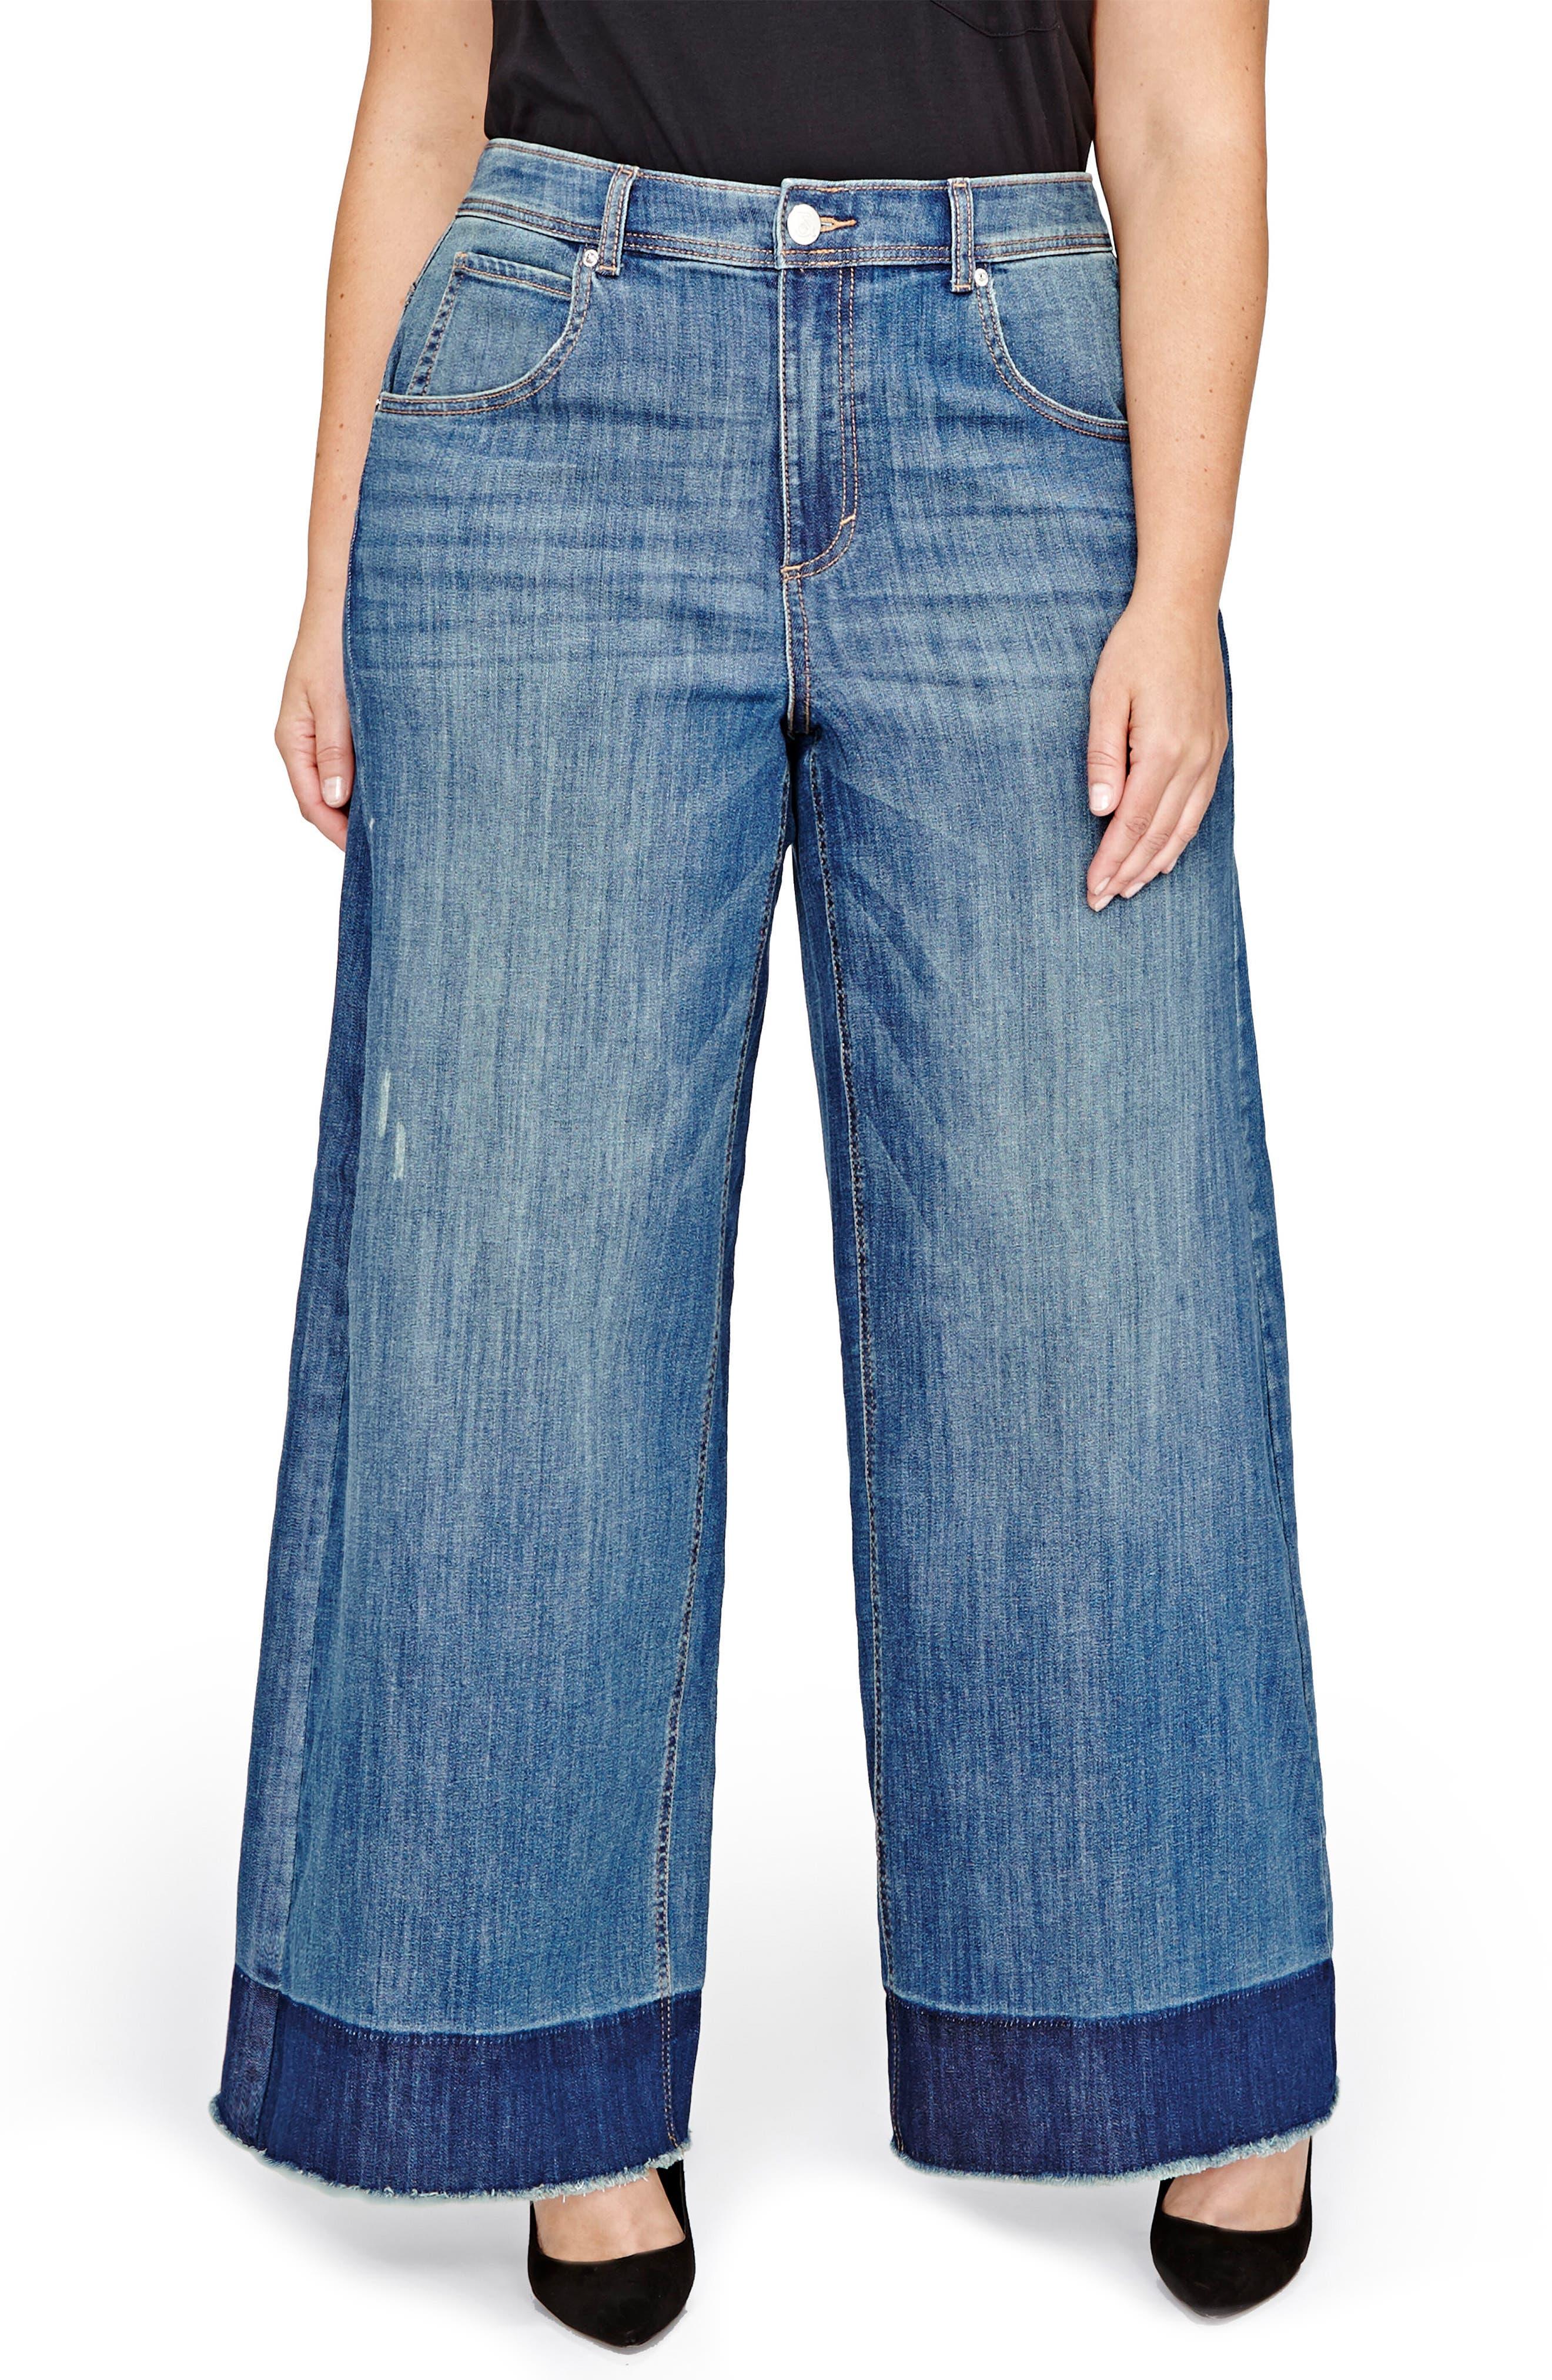 Jordyn Woods High Waist Wide Leg Jeans,                         Main,                         color, Medium Wash Denim